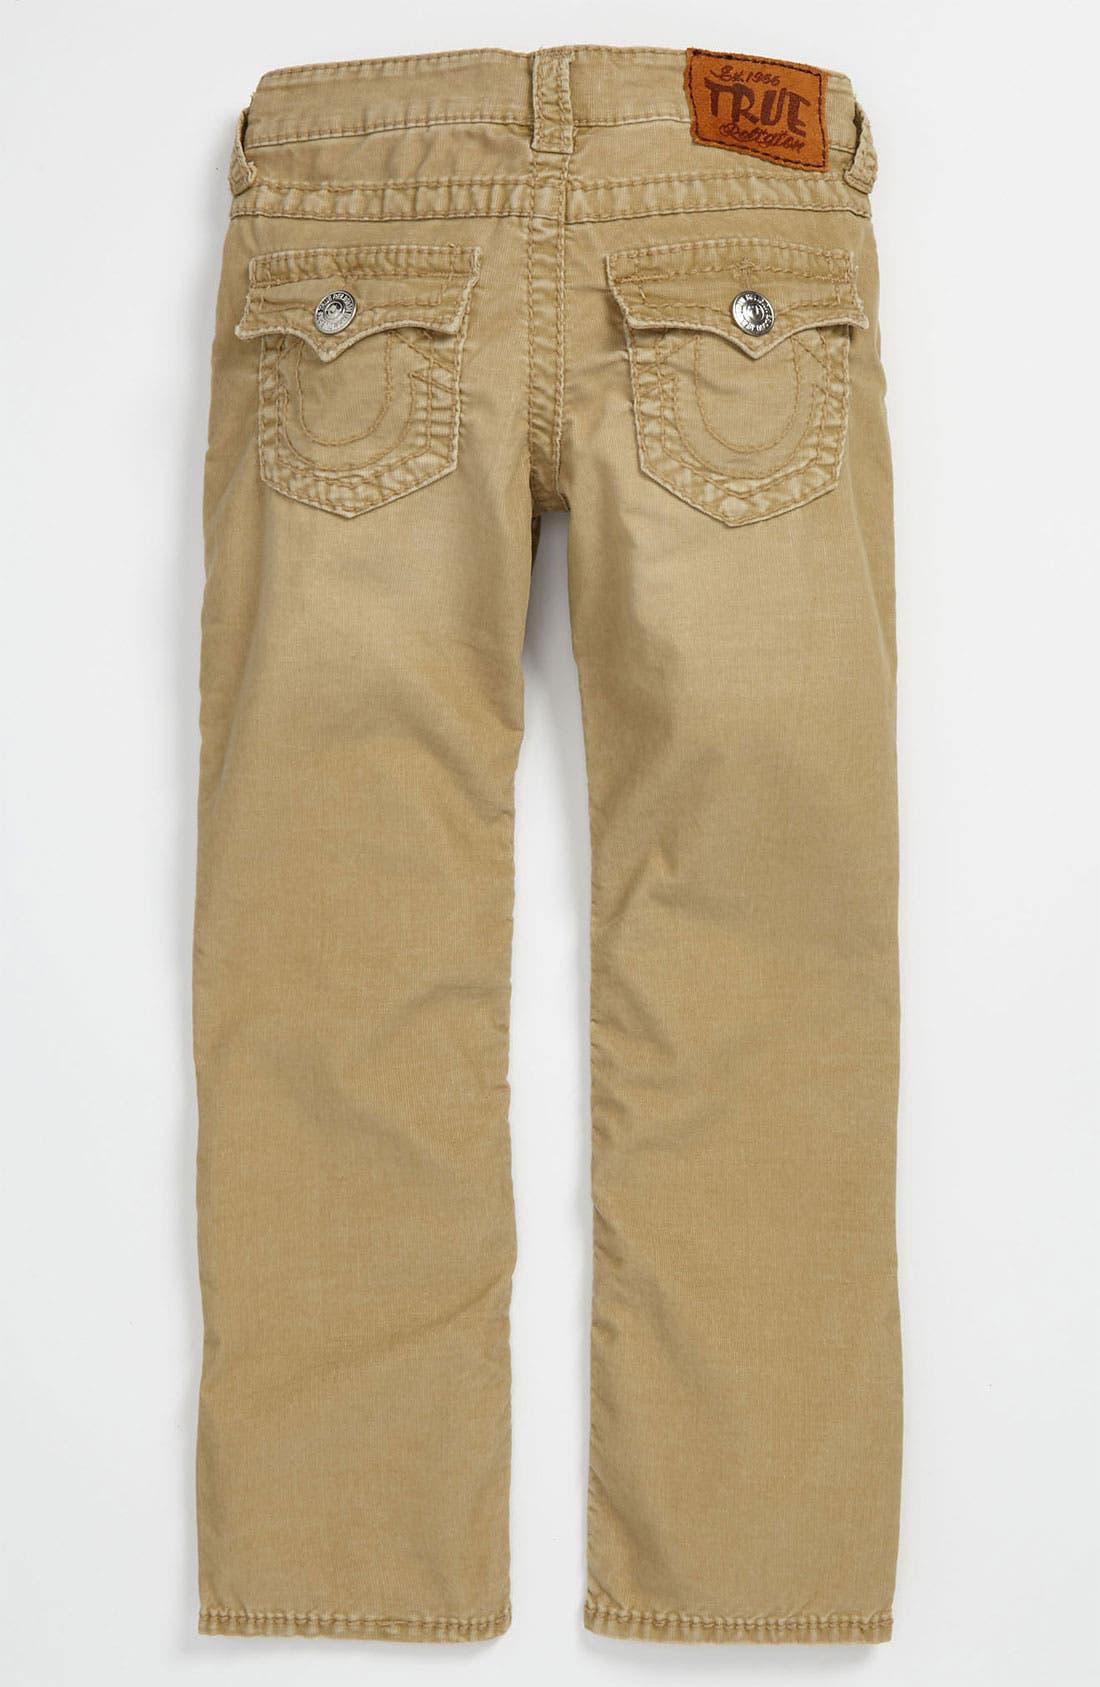 Alternate Image 1 Selected - True Religion Brand Jeans 'Jack' Straight Leg Corduroy Jeans (Big Boys)